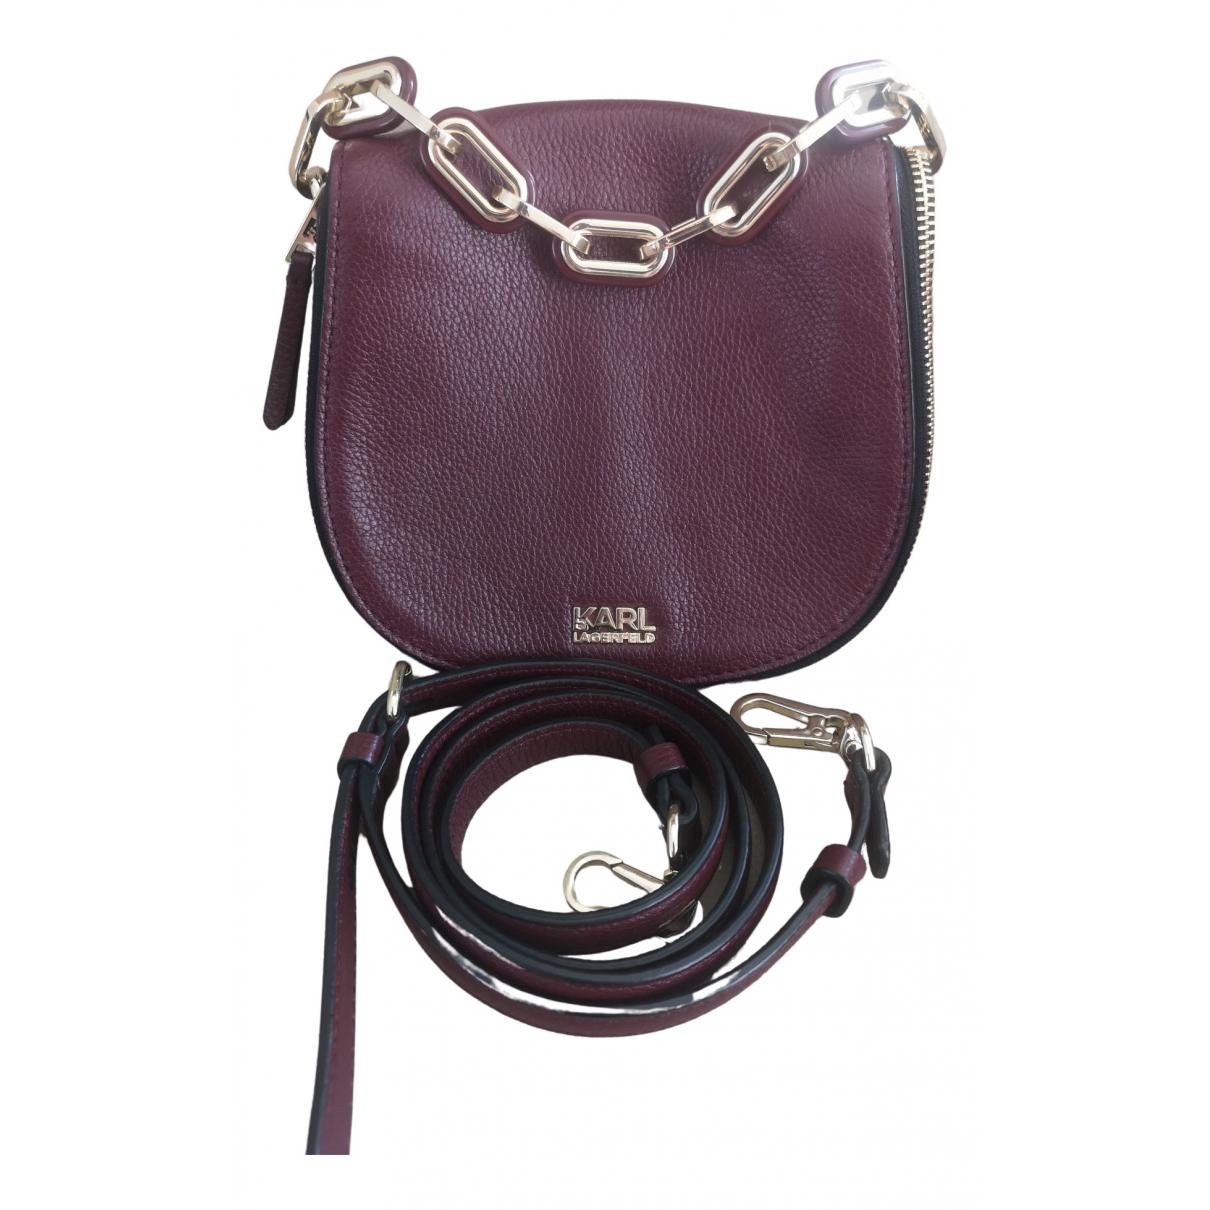 Karl Lagerfeld \N Handtasche in  Lila Leder